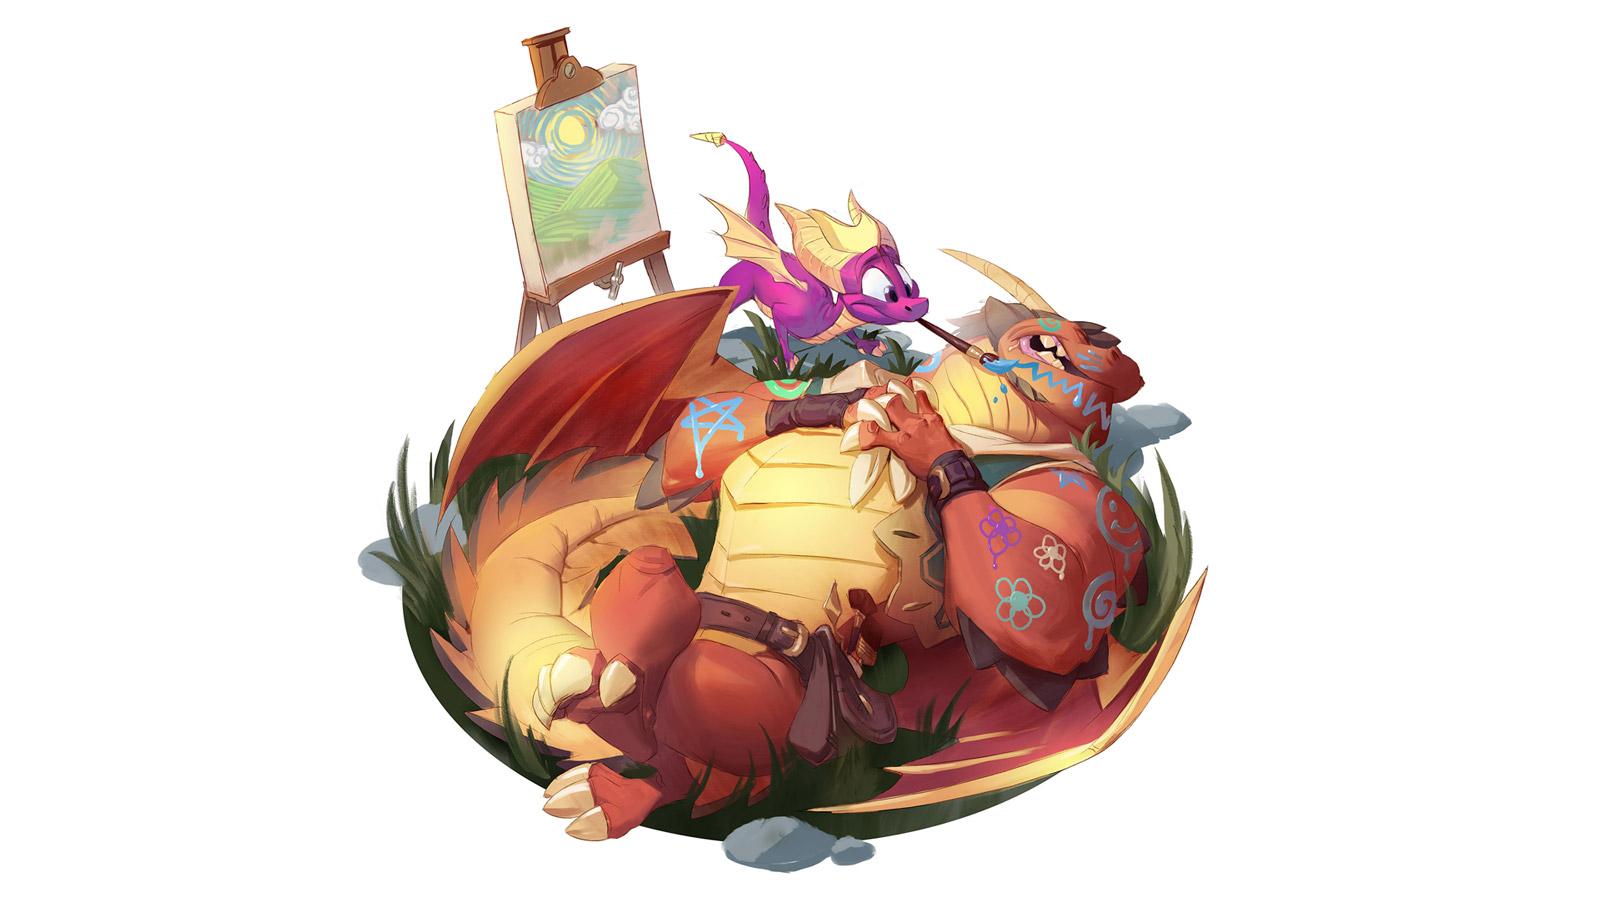 Free Spyro the Dragon Wallpaper in 1600x900